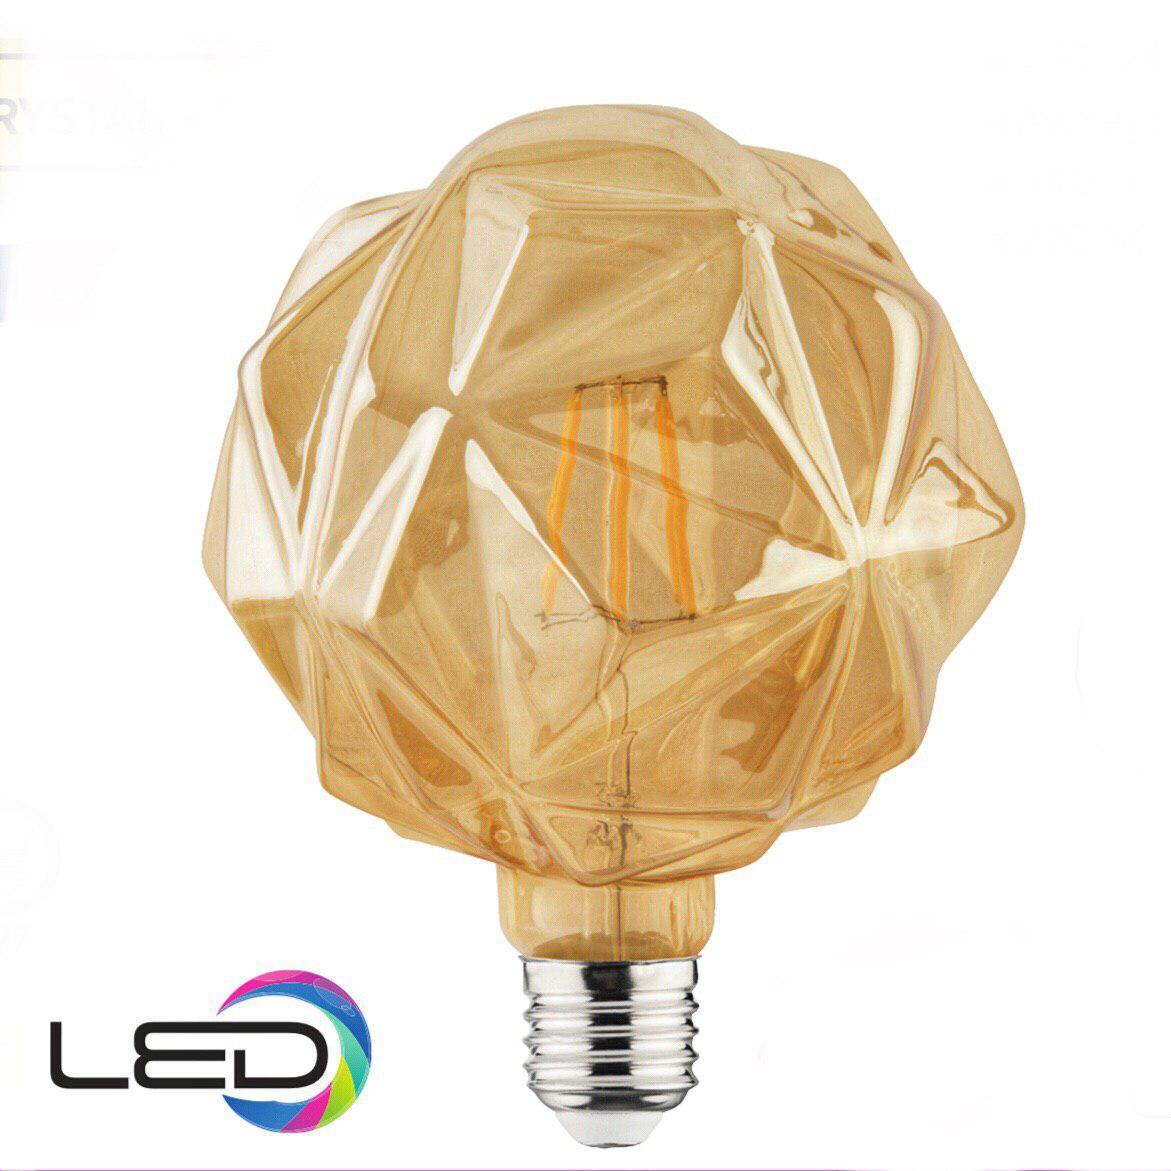 Светодиодная лампа Лампа Эдисона Led RUSTIC CRYSTAL-6